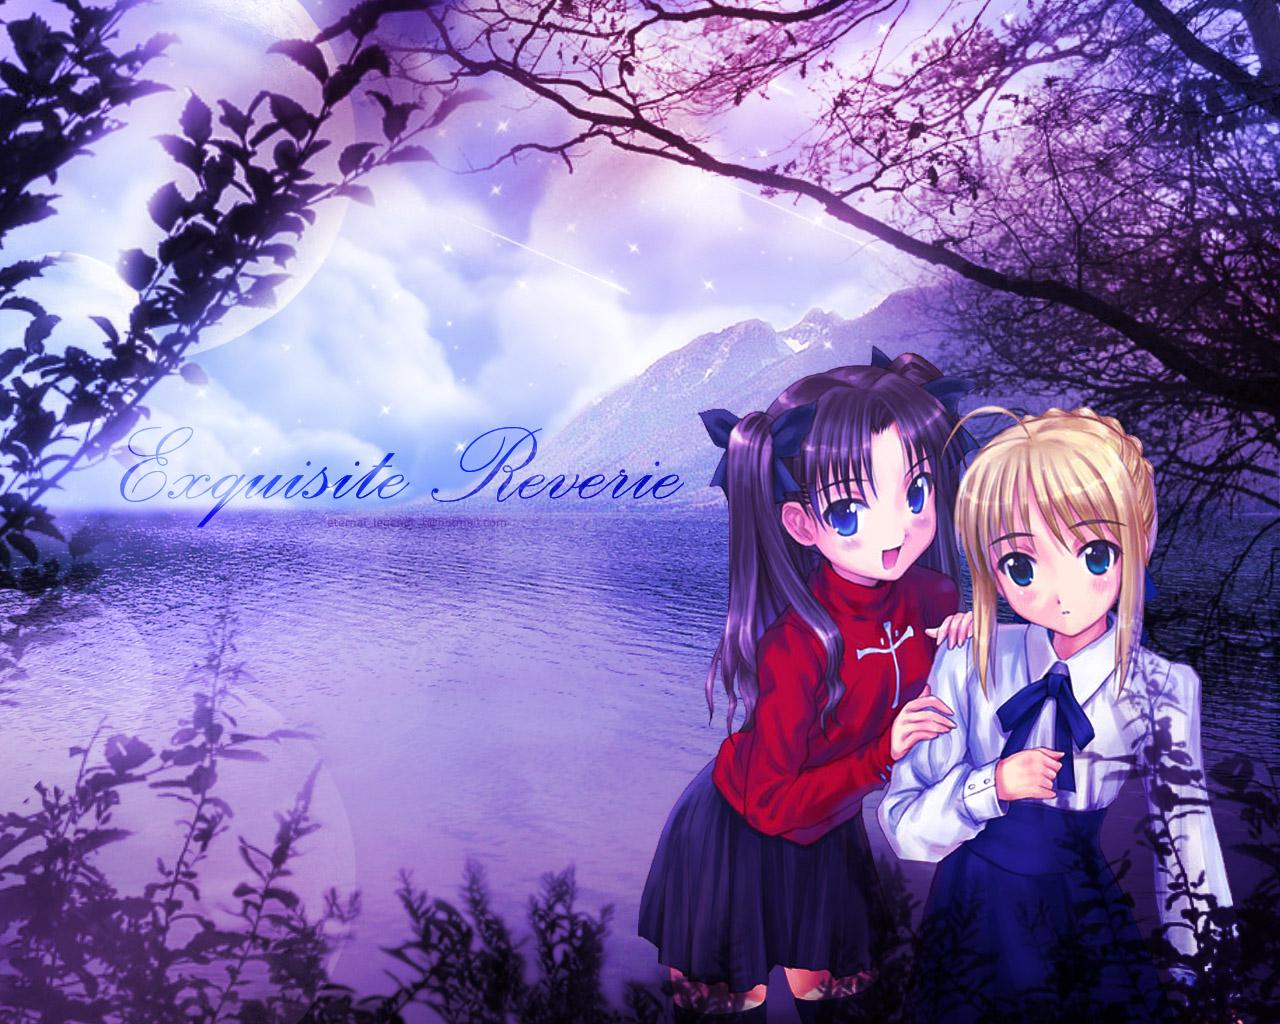 Minitokyo_Fate-Stay_Night_Wallpapers_247840.jpg